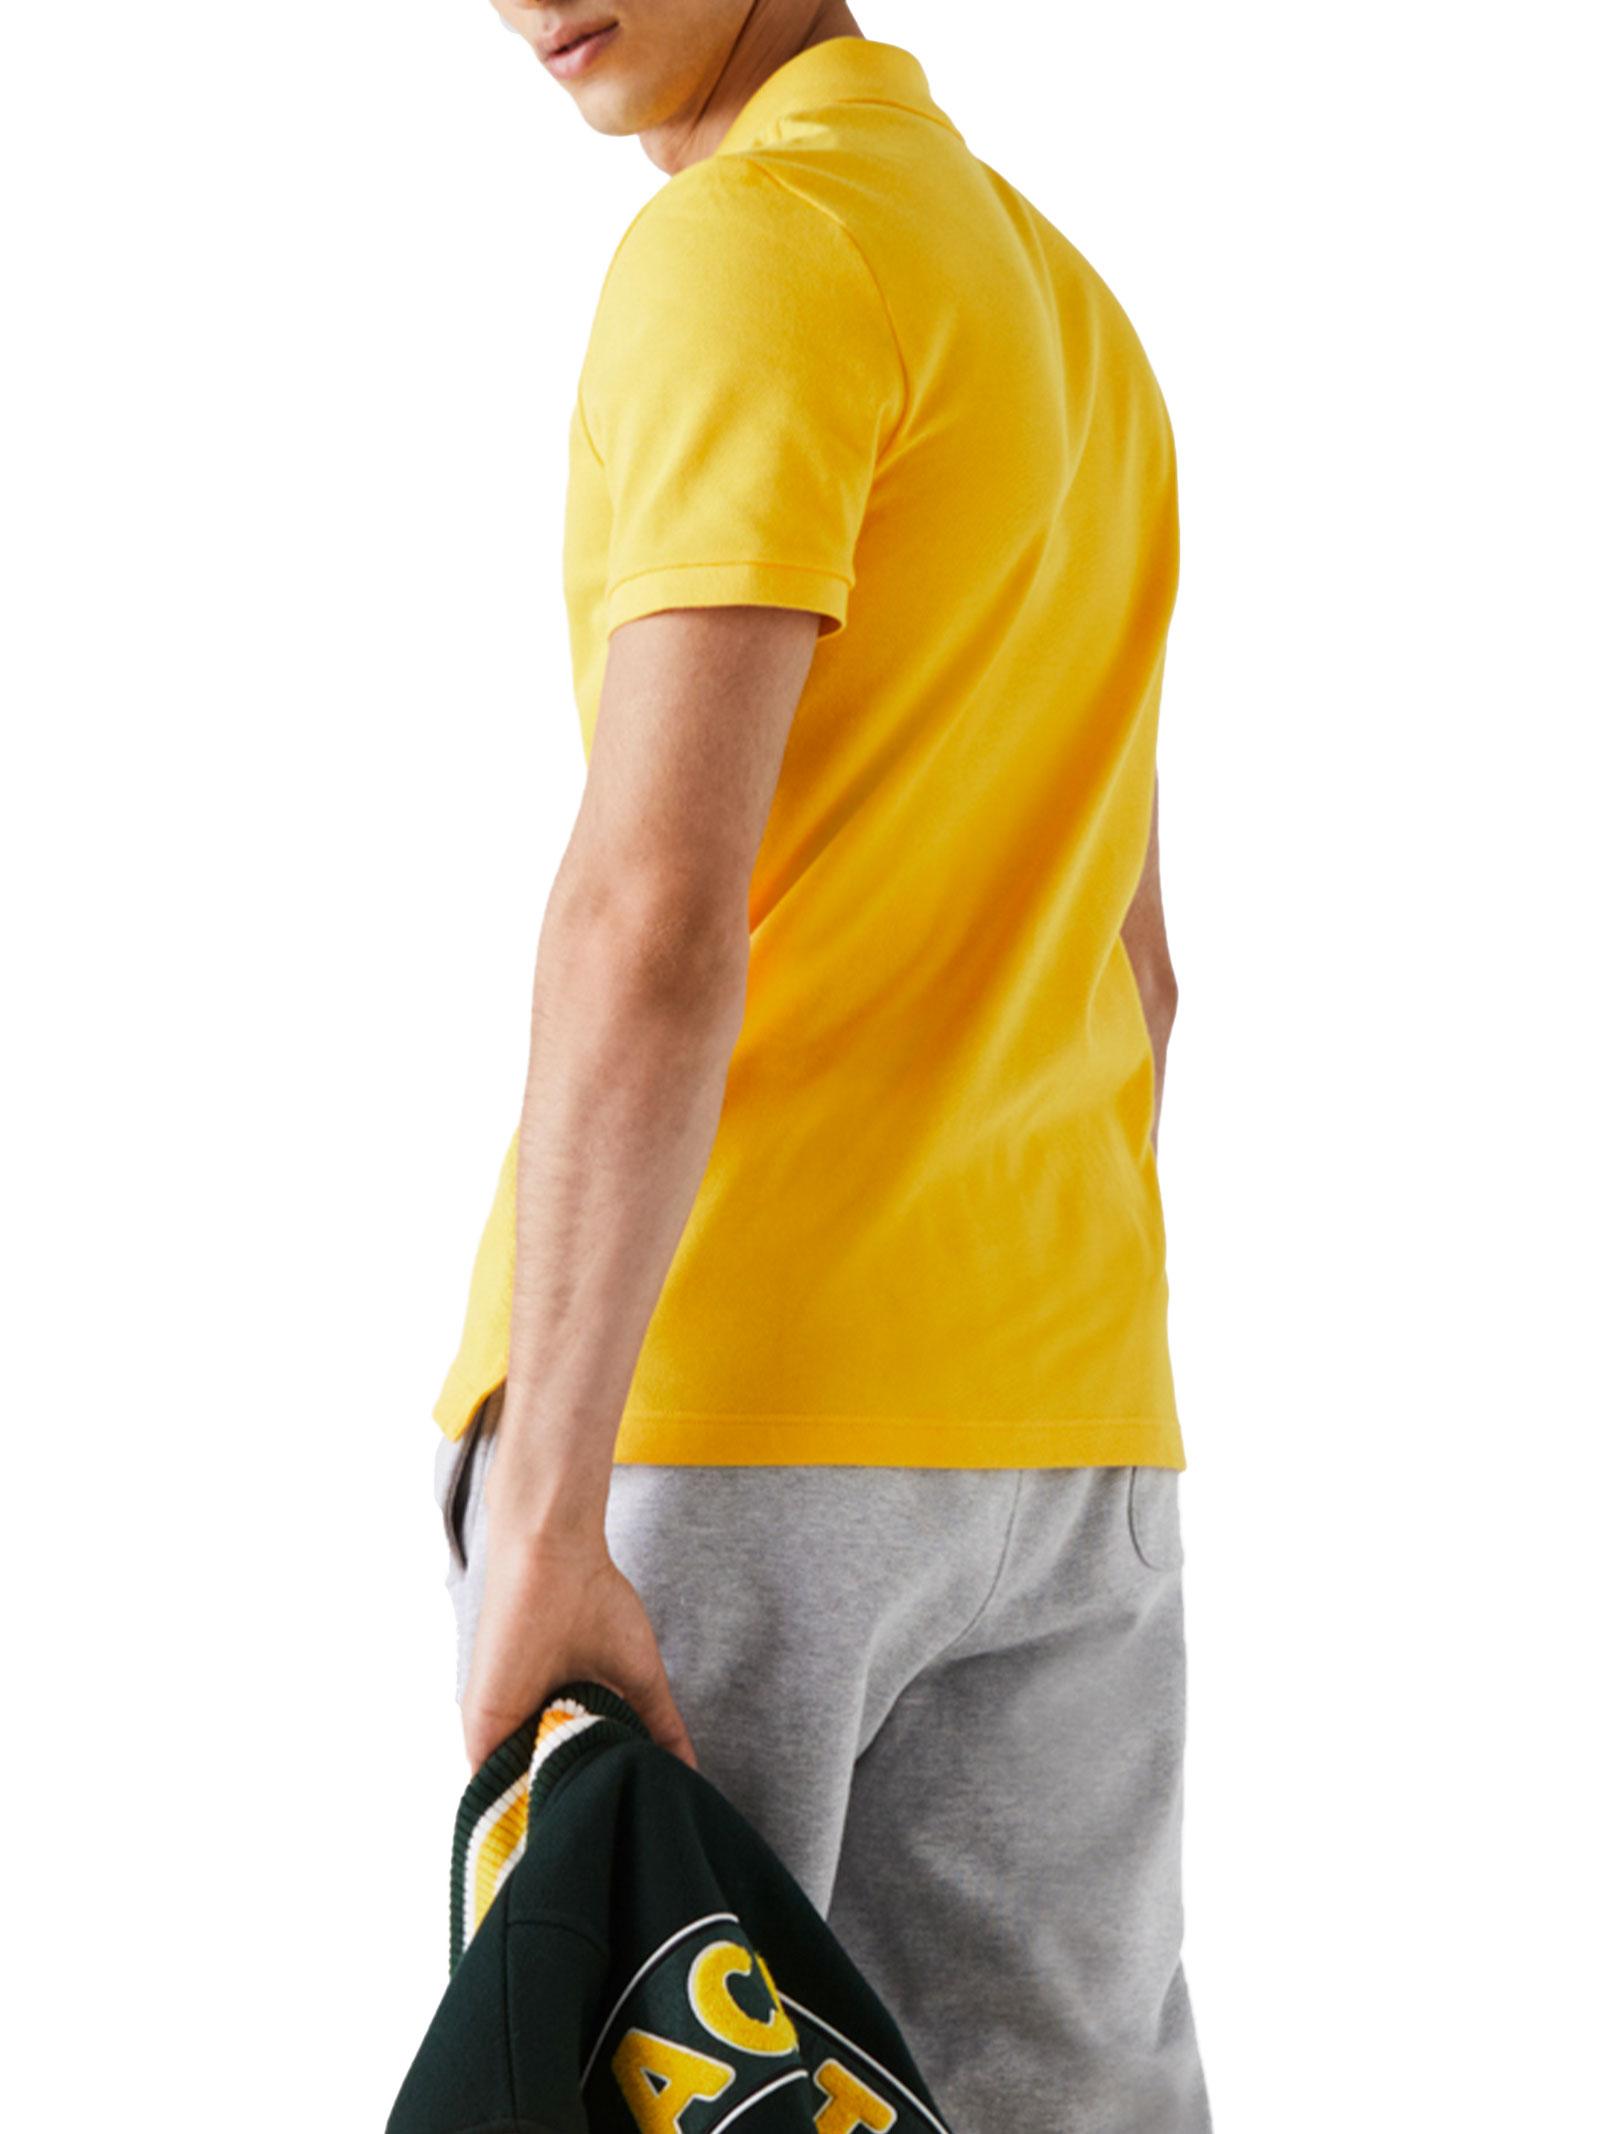 Polo  slim fit giallo  LACOSTE | Polo | PH4012US3